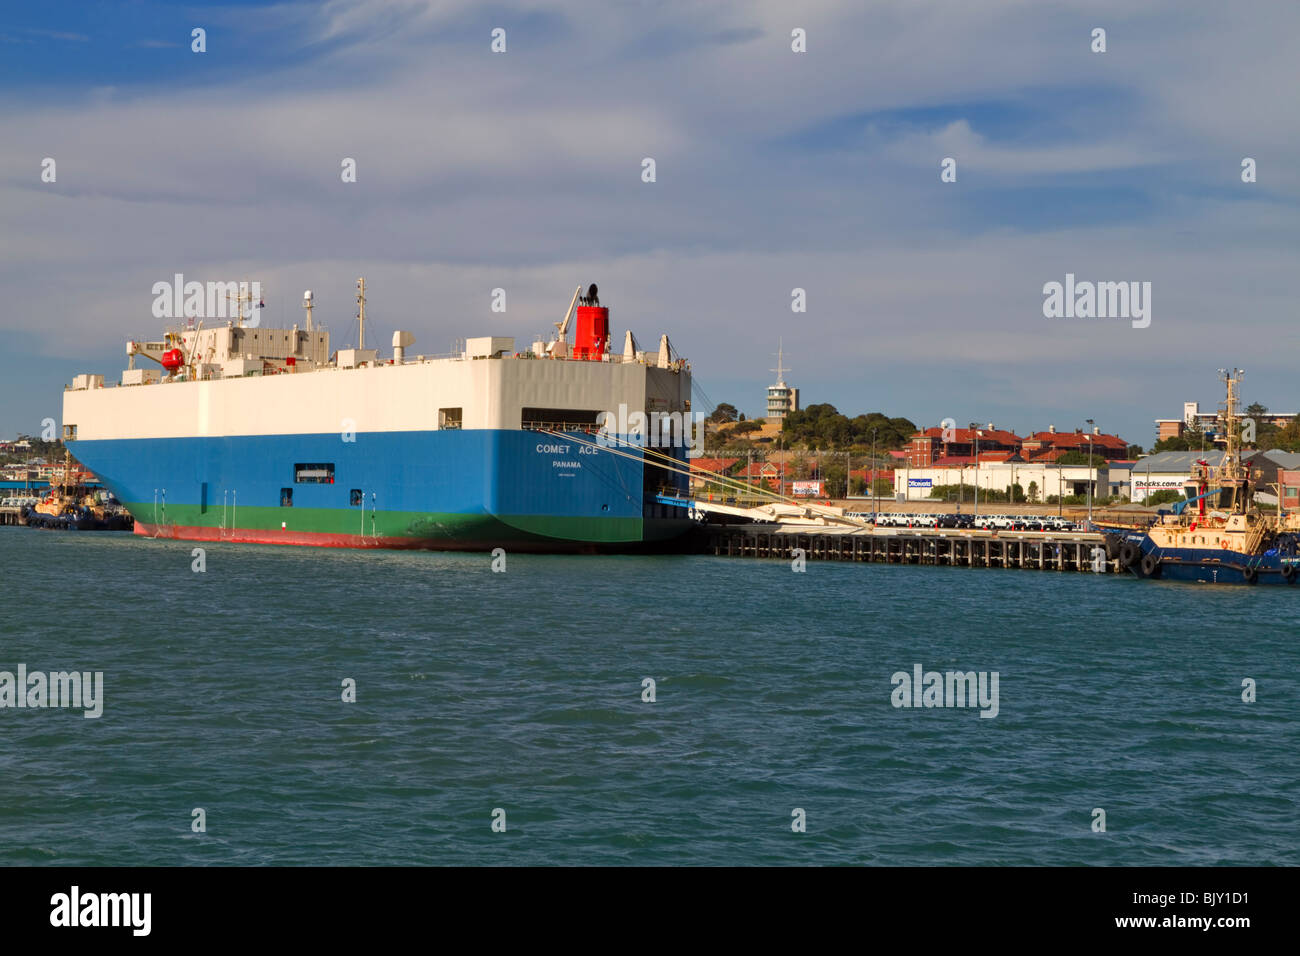 Comet Ace, RORO vehicle Cargo ship registered in Panama docked in Fremantle, Western Australia - Stock Image